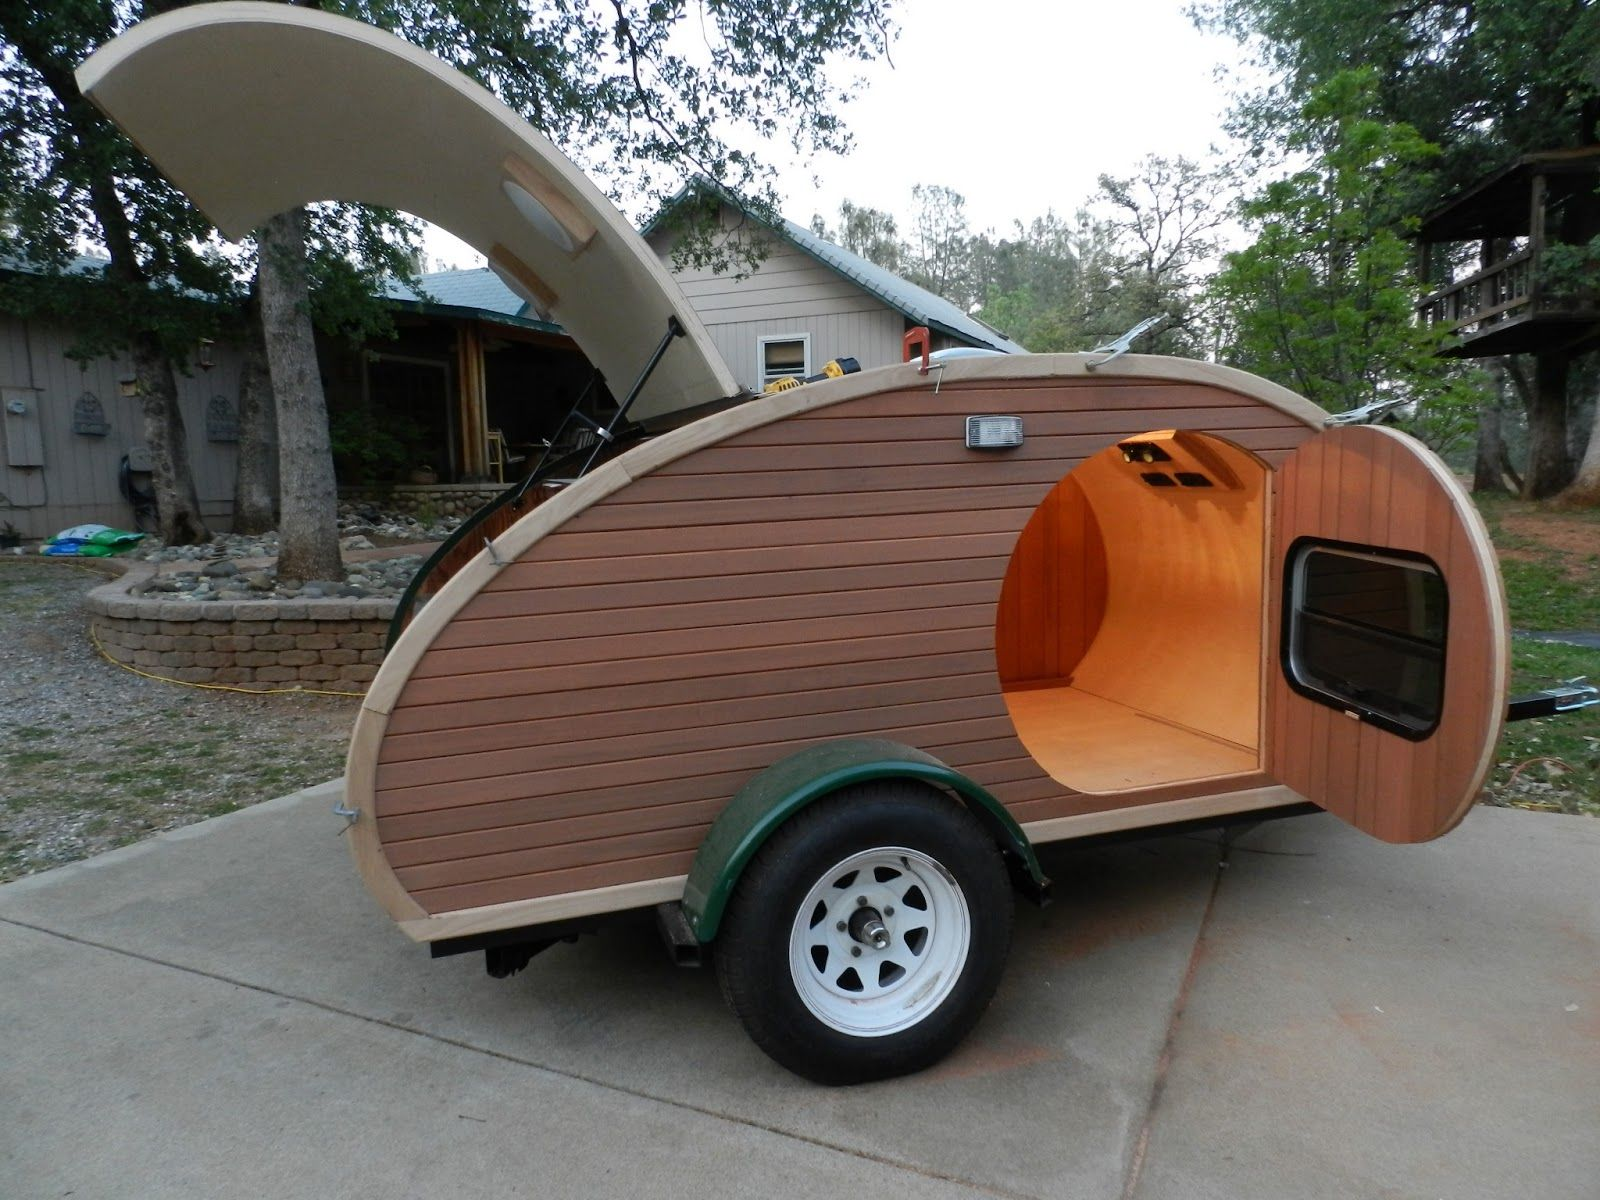 Eds teardrop trailer project teardrop camper teardrop